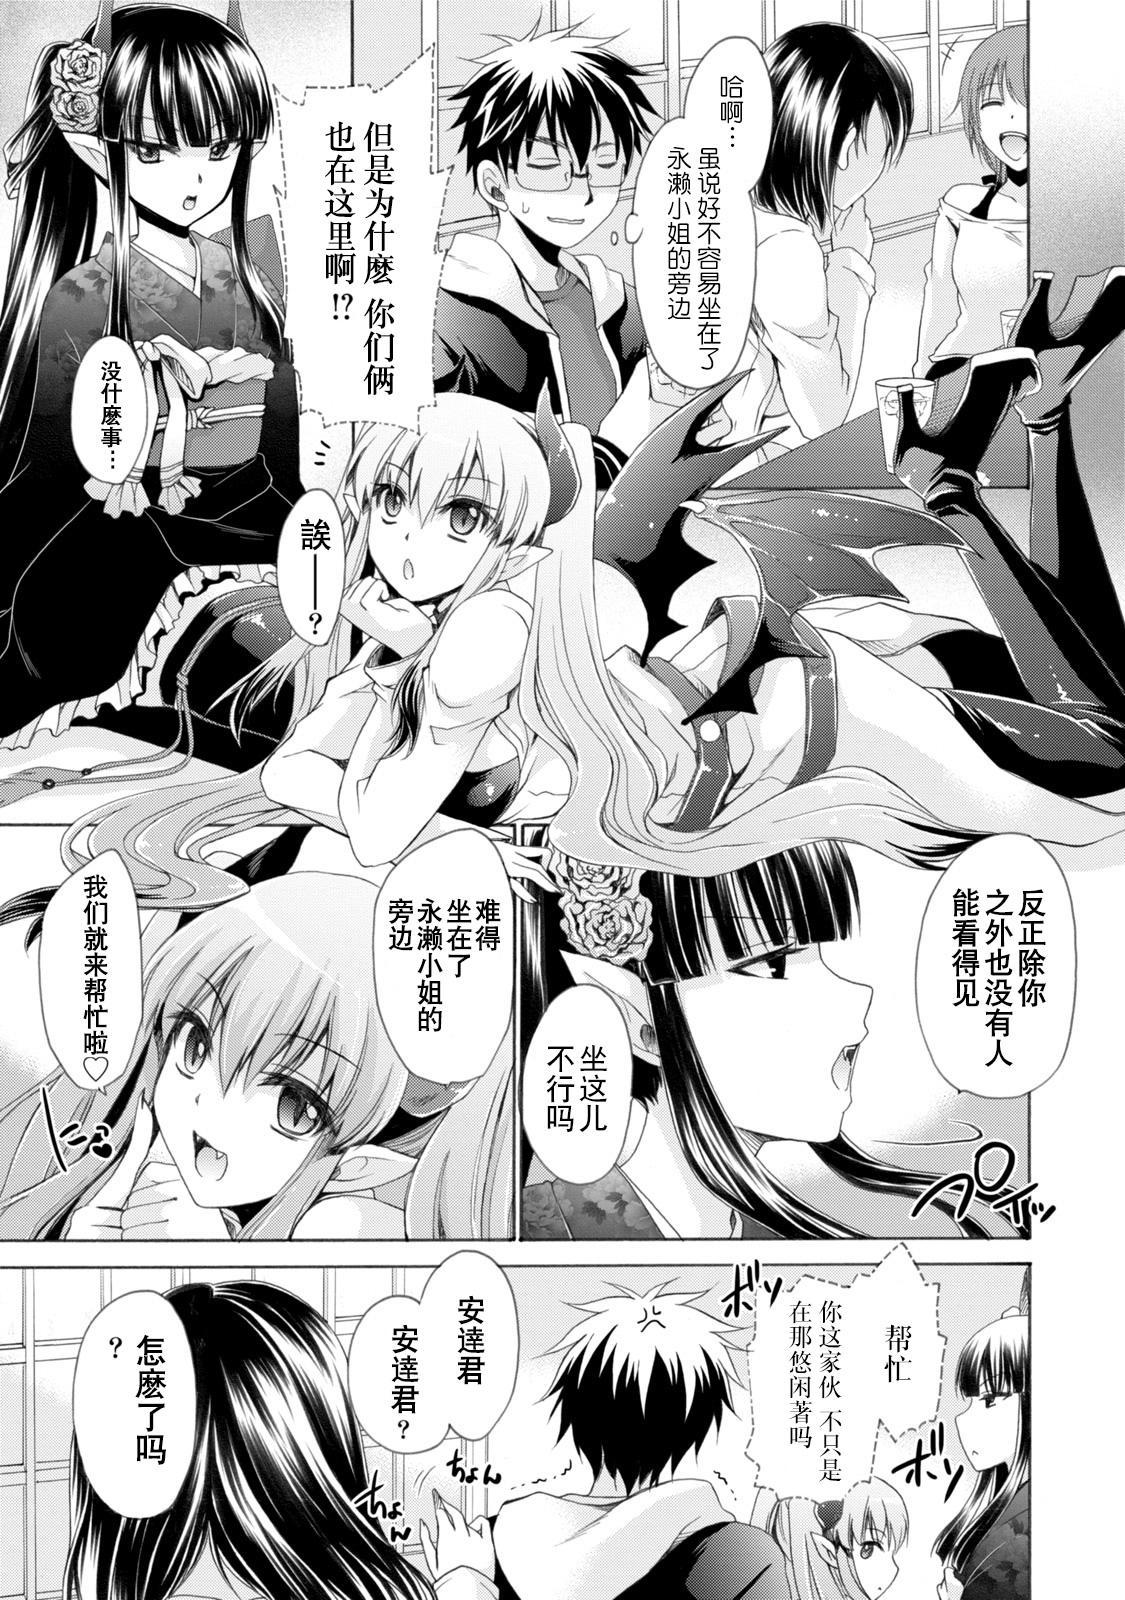 [Shinonome Ryu] Ore to Kanojo to Owaru Sekai - World's end LoveStory ch.1-9 [Chinese] [爱弹幕汉化组] [Digital] 54